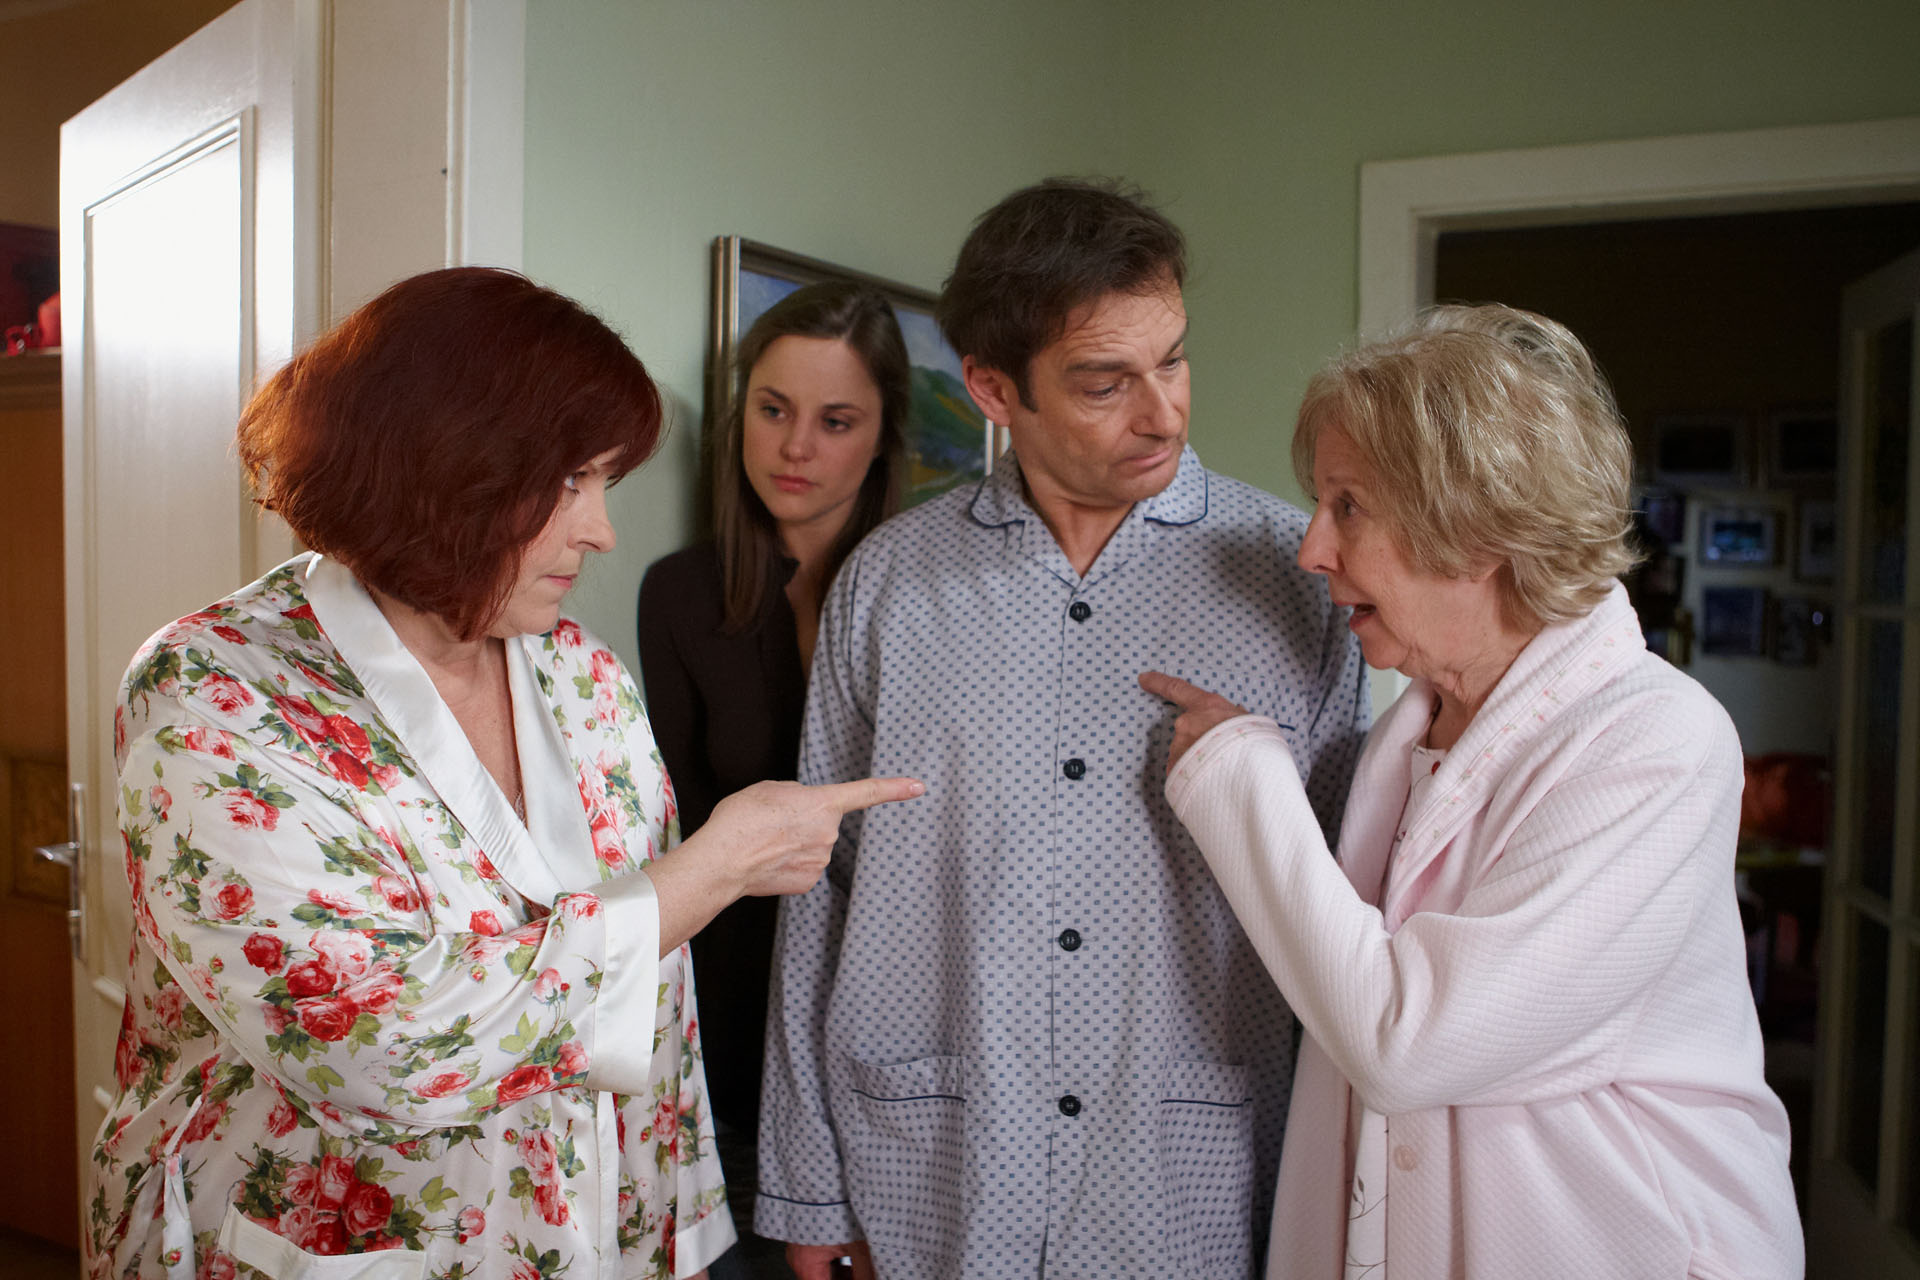 © Star*Film - Elfi Eschke, Ina-Alice-Kopp, Andreas Steppan und Bibiana Zeller